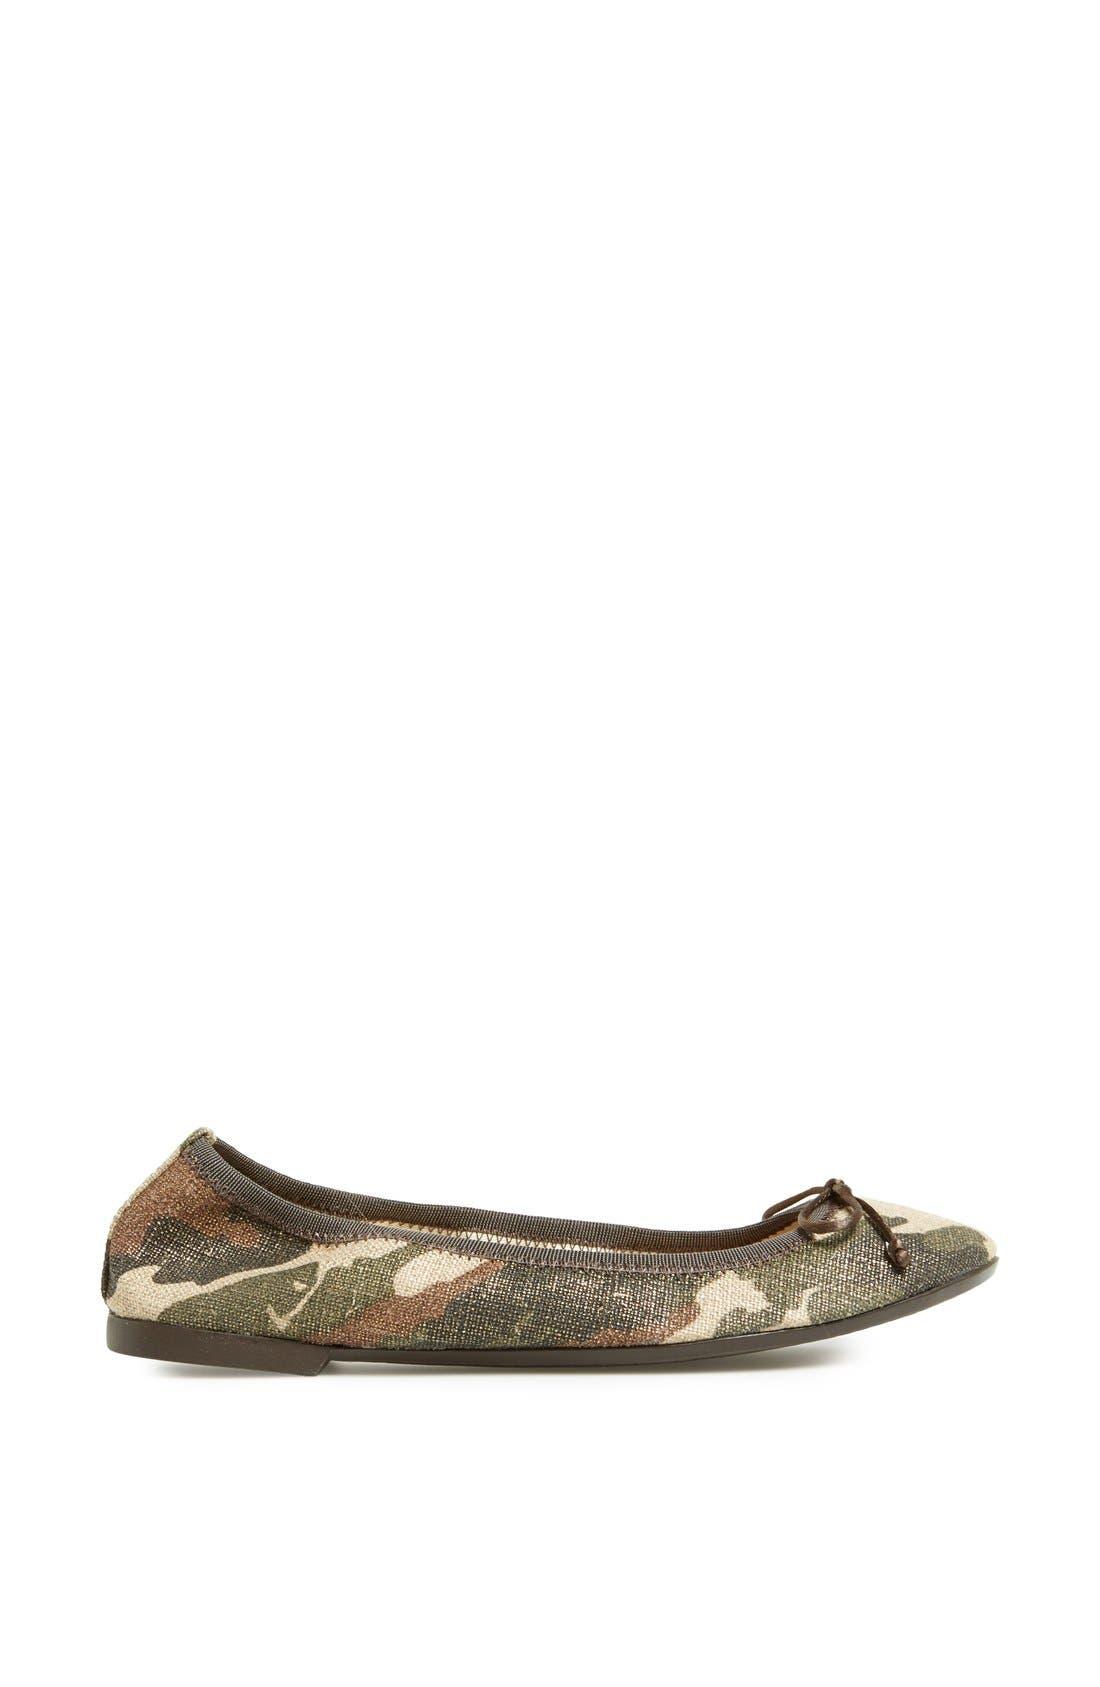 Camouflage Ballet Flat,                             Alternate thumbnail 3, color,                             340